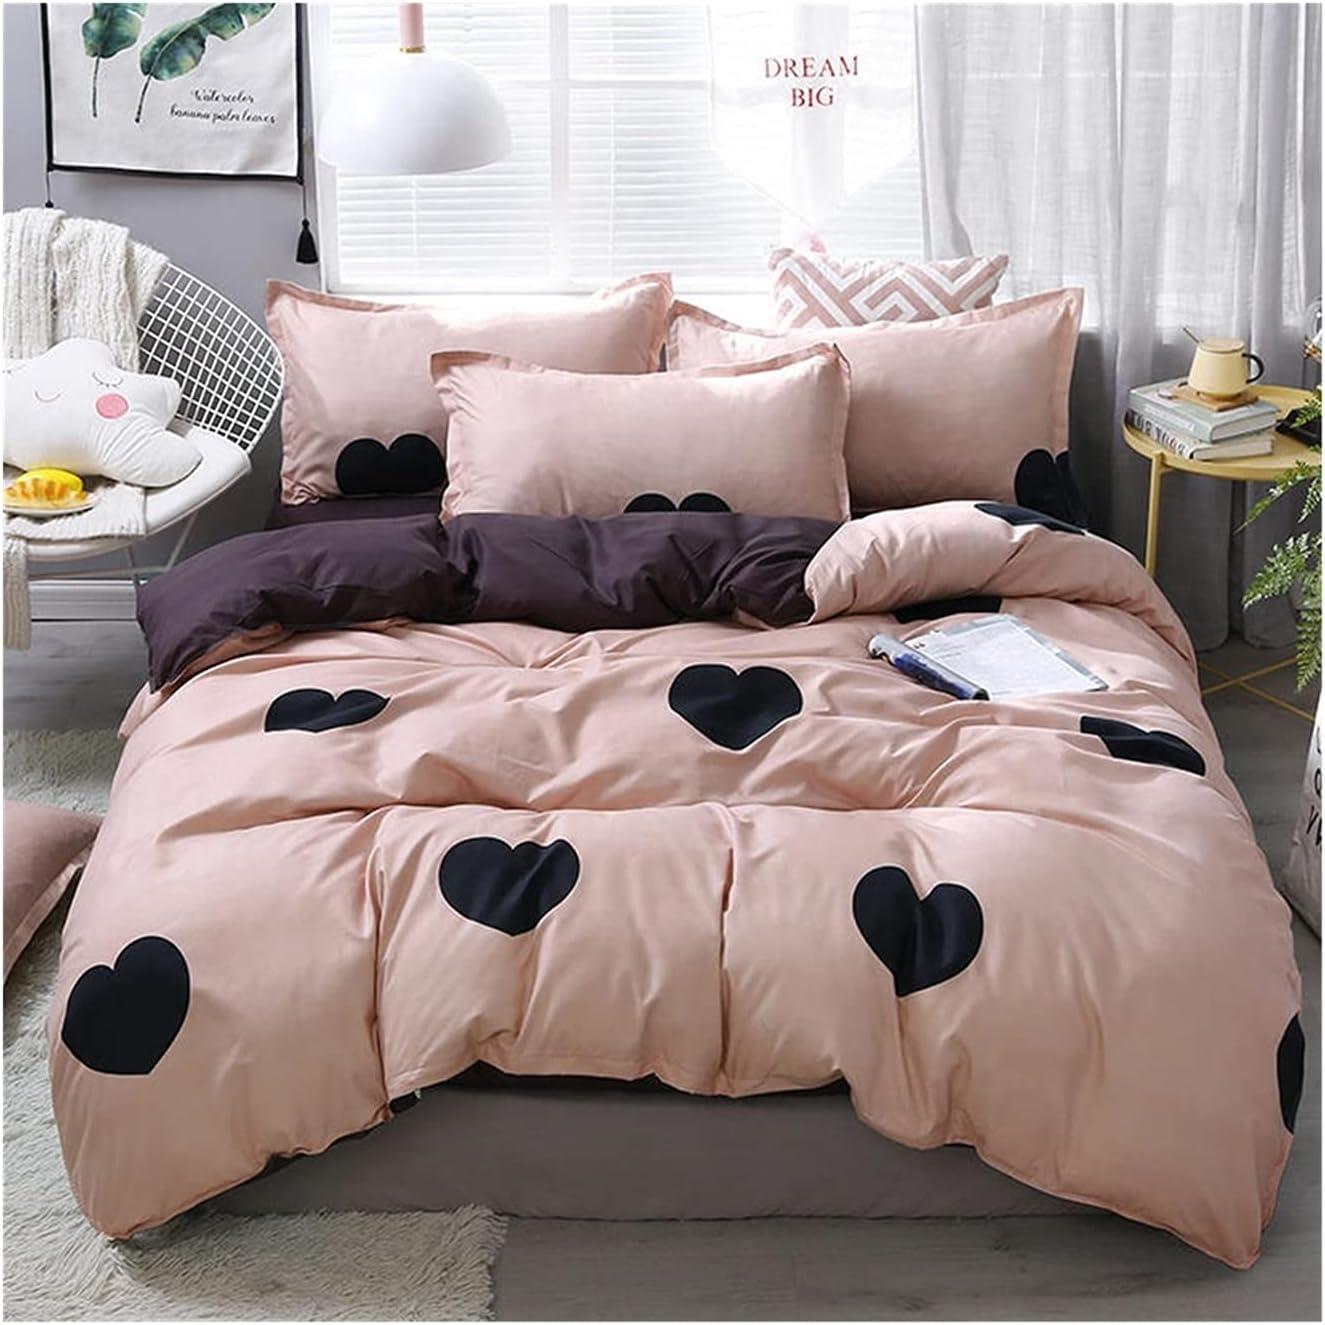 LSDJ Max 86% OFF QMDSH Home Brand Cheap Sale Venue Textile Girl Bedding Duvet Peach Pink Set Cover